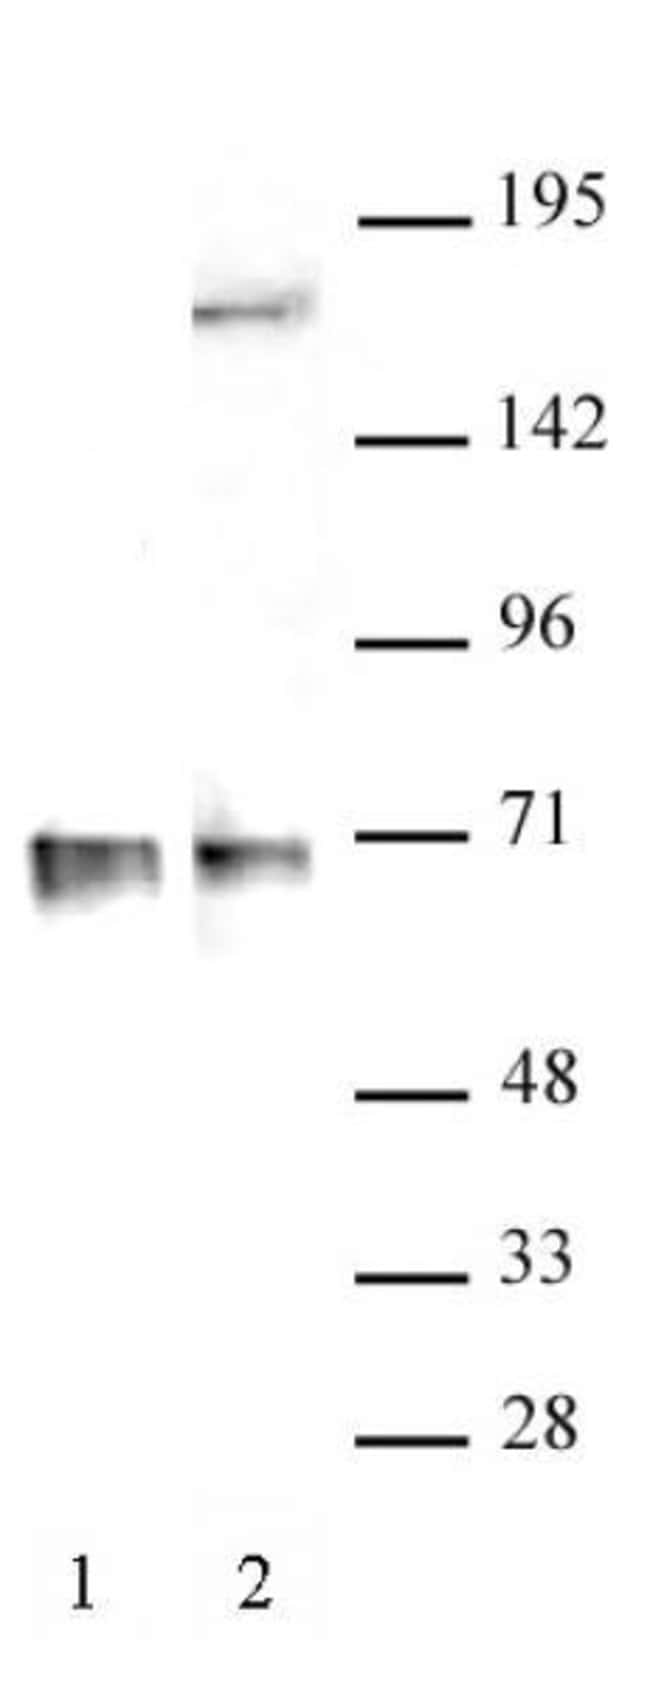 RBM39 Rabbit anti-Human, Unconjugated, Polyclonal, Active Motif:Antibodies:Primary